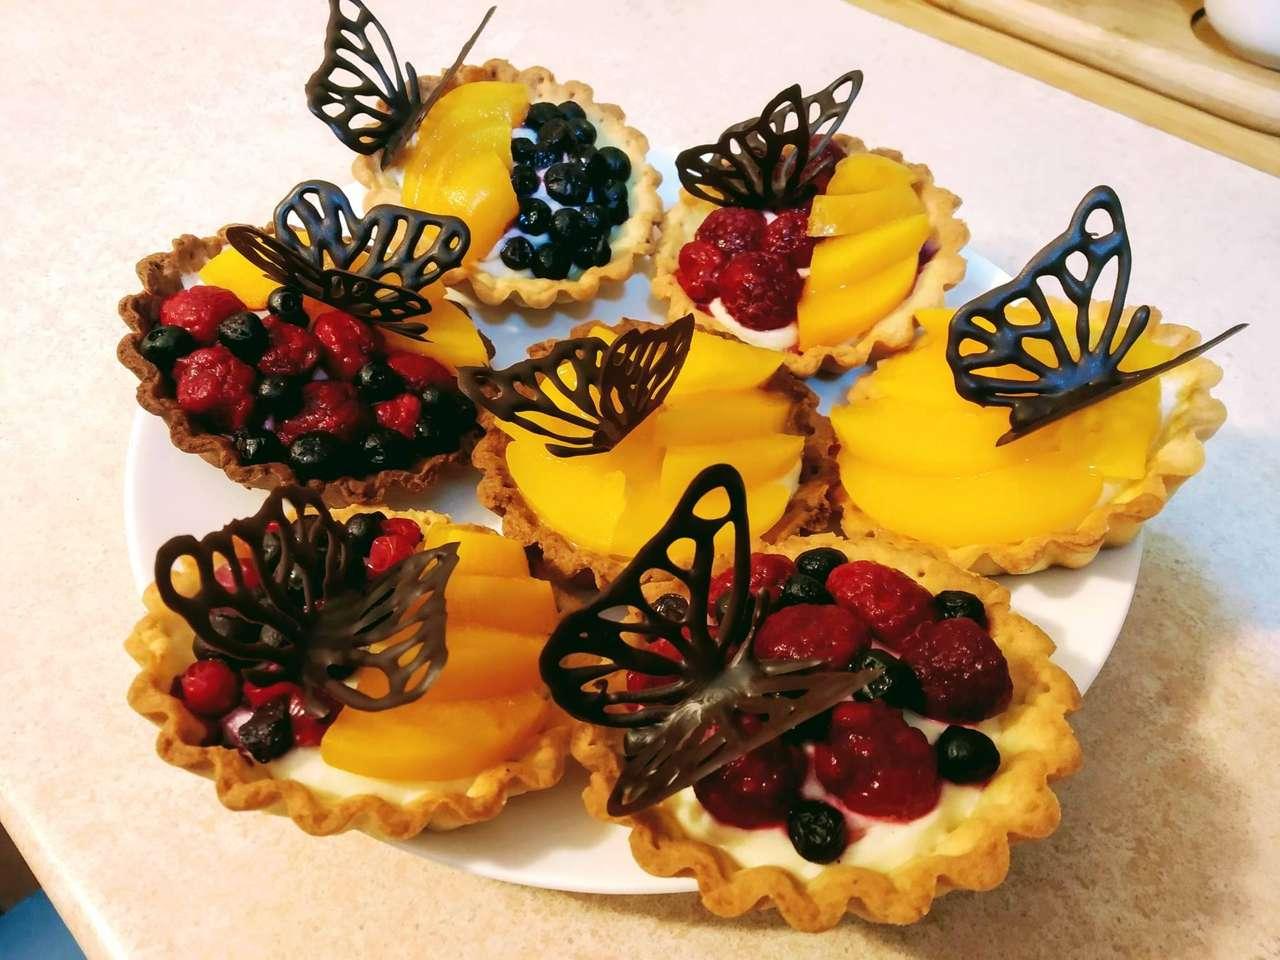 Motýli puzzle - Puzzle cookies motýli (5×4)